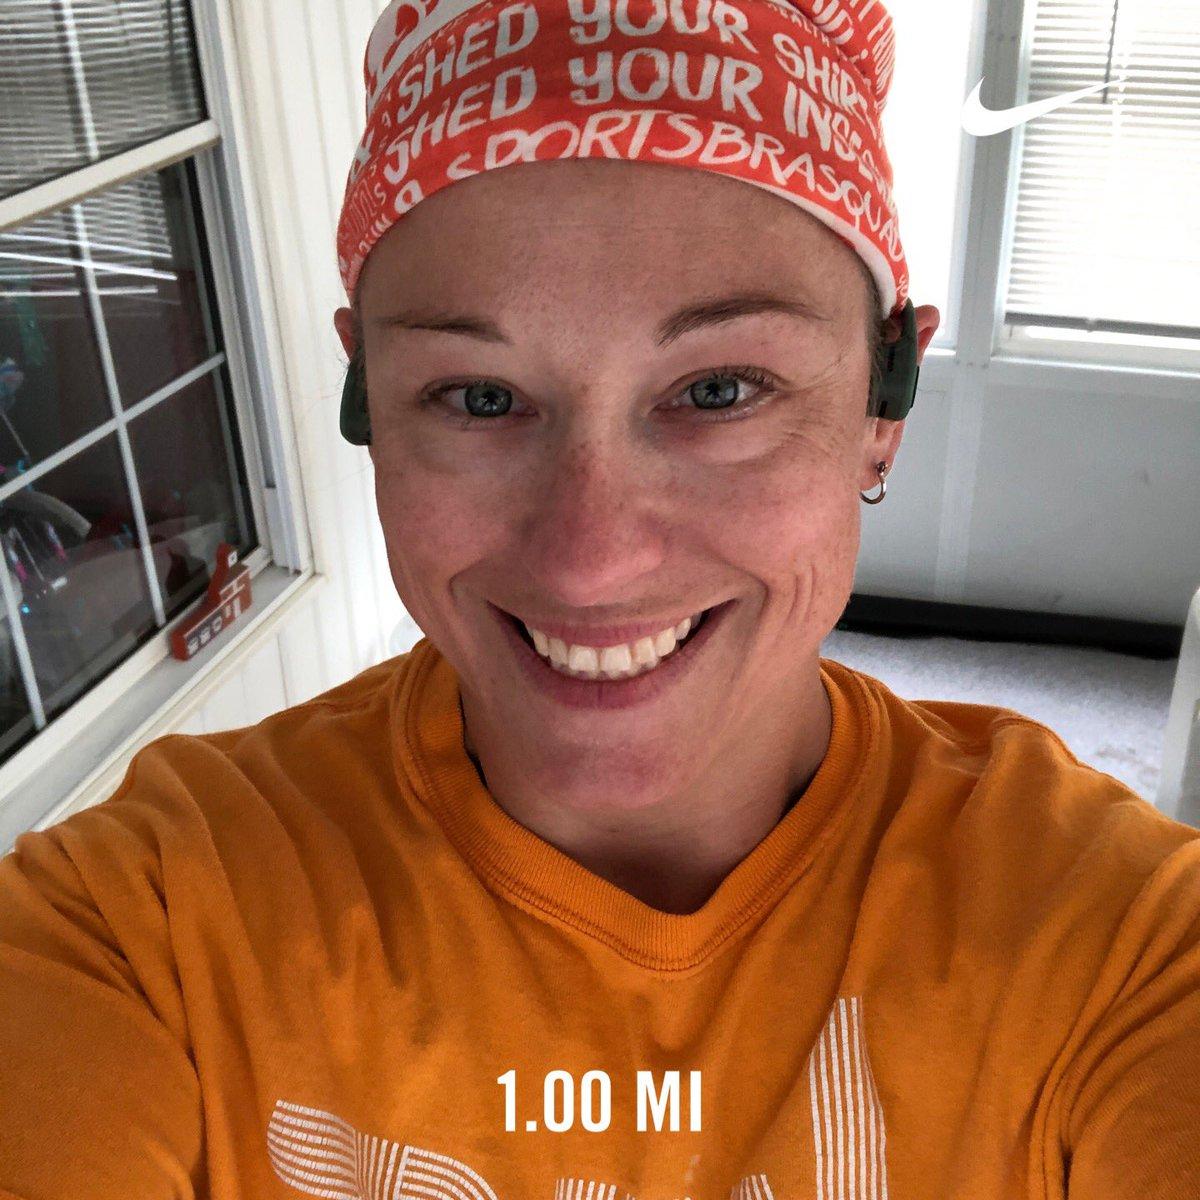 RT+@Run_BeckyRun: 384.29/800 ~ 1-mile shakeout during lunch today #plowon #irun4shelby #irun4lucy #irun4johnya #irun4seb #irun4sarah #bamr #bibchat #bibravepro #nuunlove #nuunlife #oofos #orangemud #nuunambassador2019 <br>http://pic.twitter.com/4sgzGw74P4  #runners #running